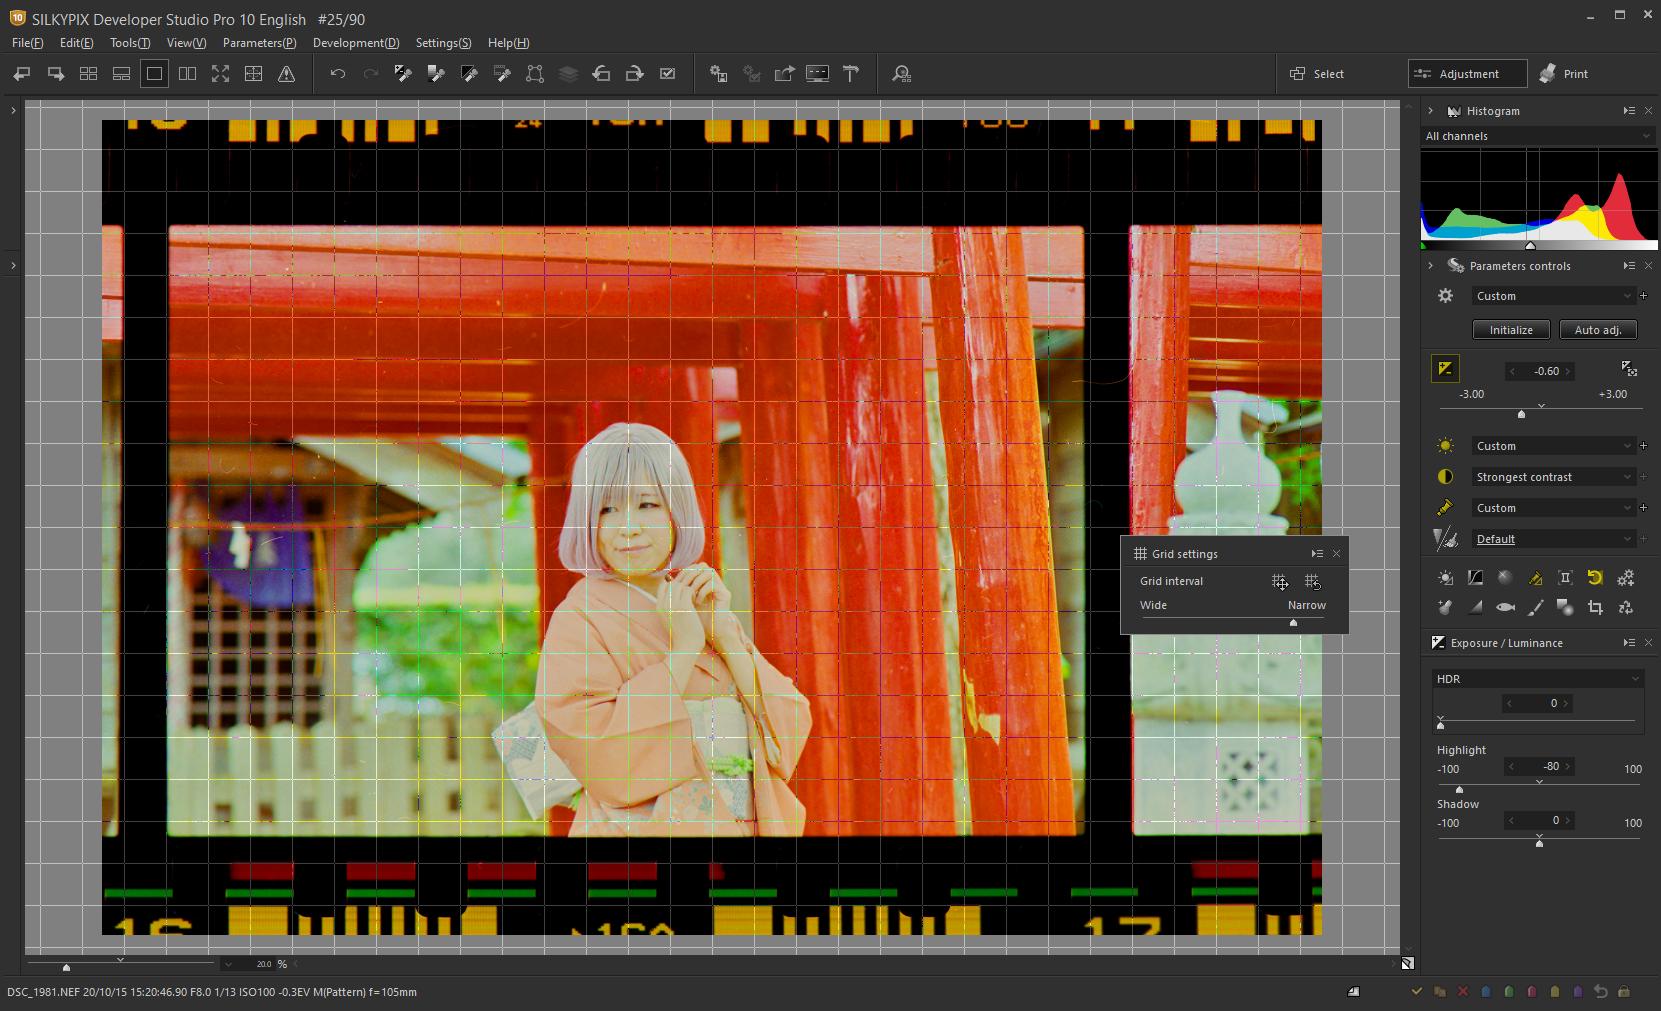 Rotation/Shift lens effect 2